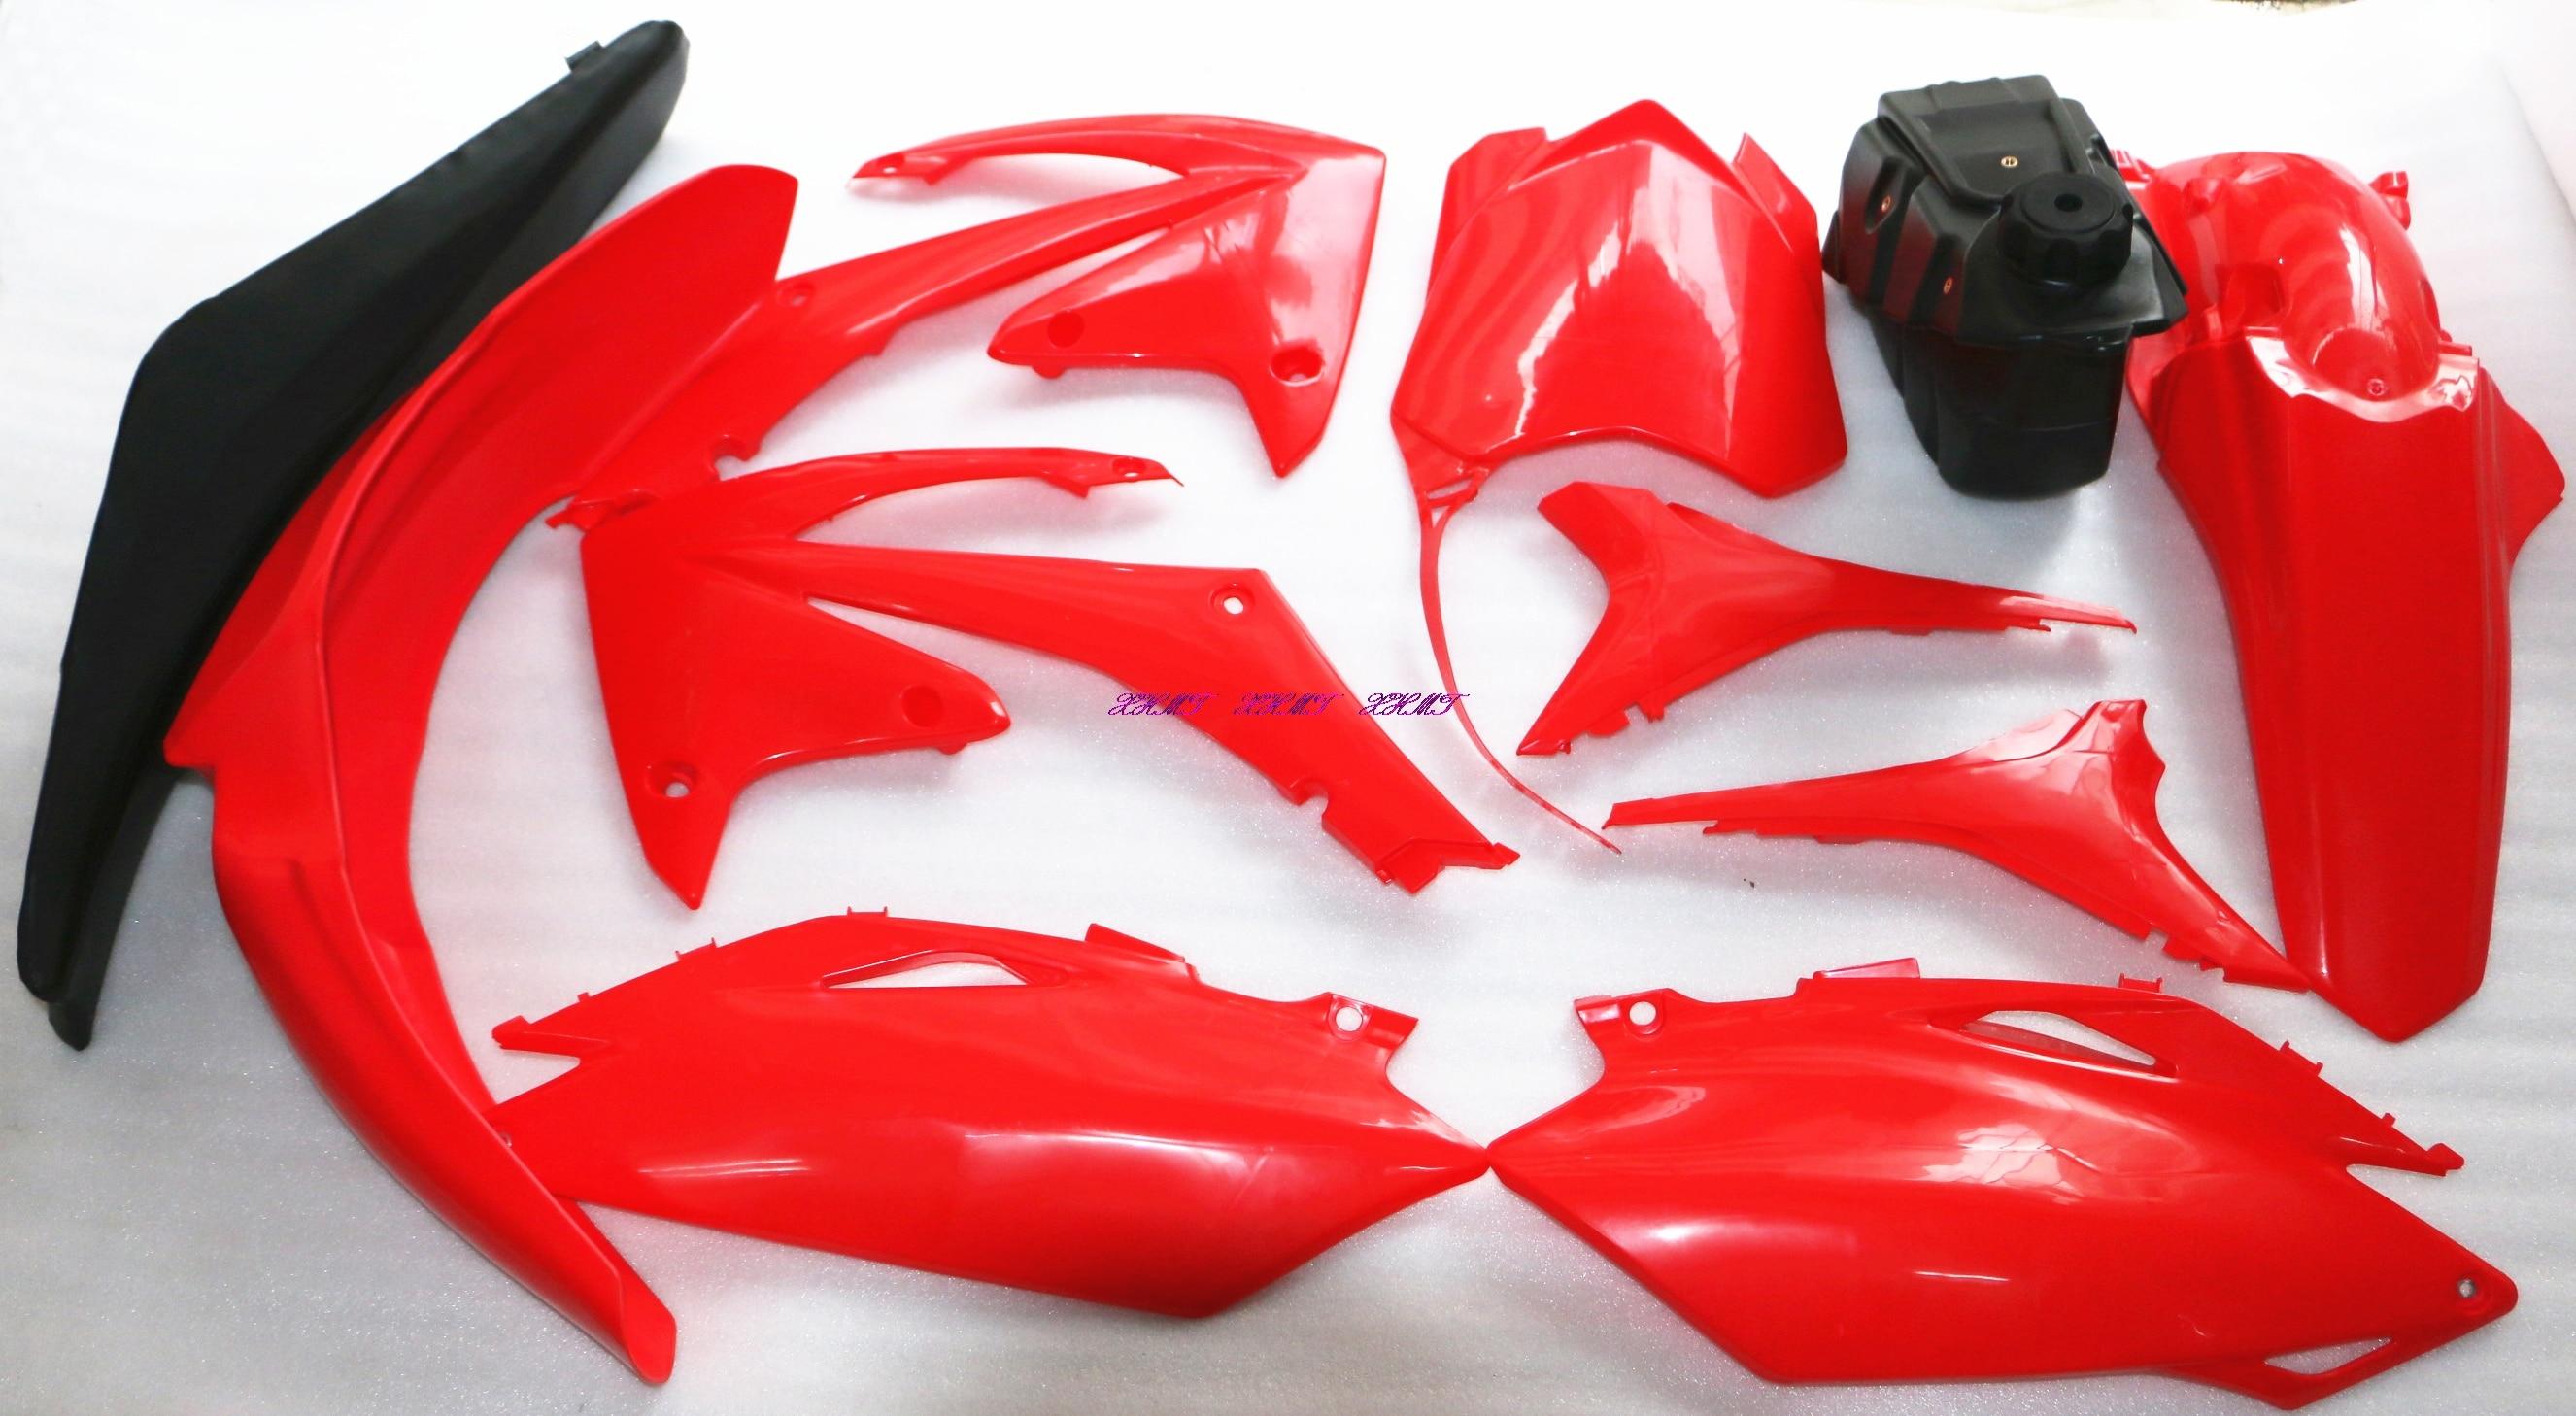 Plastic Bodywork Fairing Body Kit for HONDA CRF250R 2010 2012 CRF 250 450 R CRF450R 2009 2010 2012